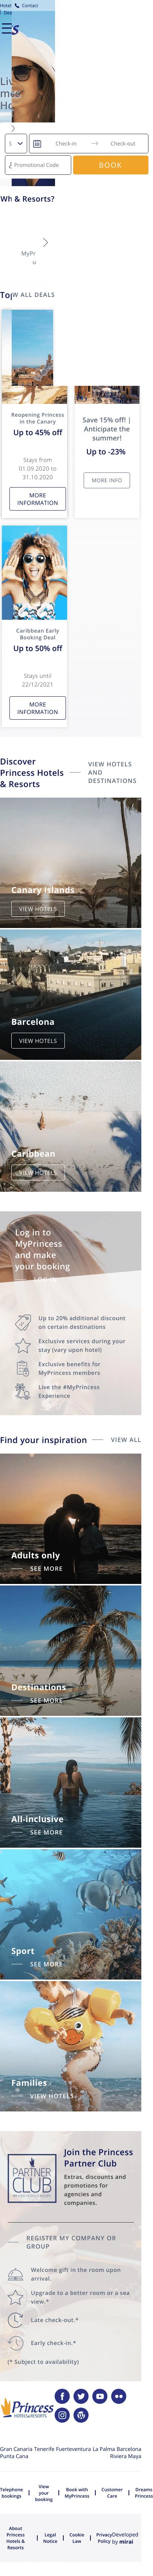 Princess Hotels Coupon